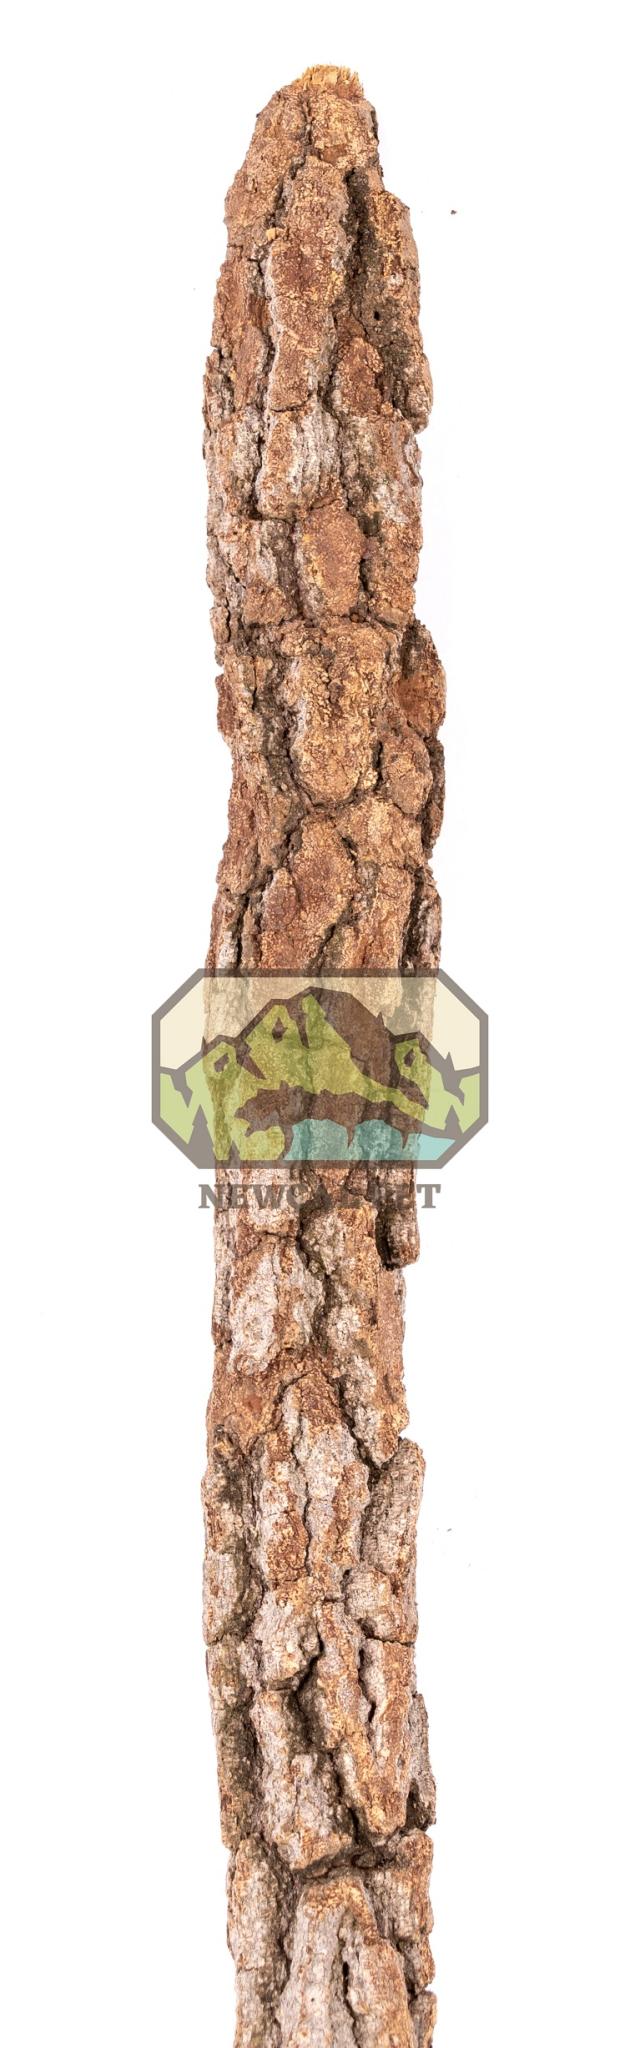 NewCal Pets Branche de liège naturel Galho Estela - Galho Estela Natural Cork Branch